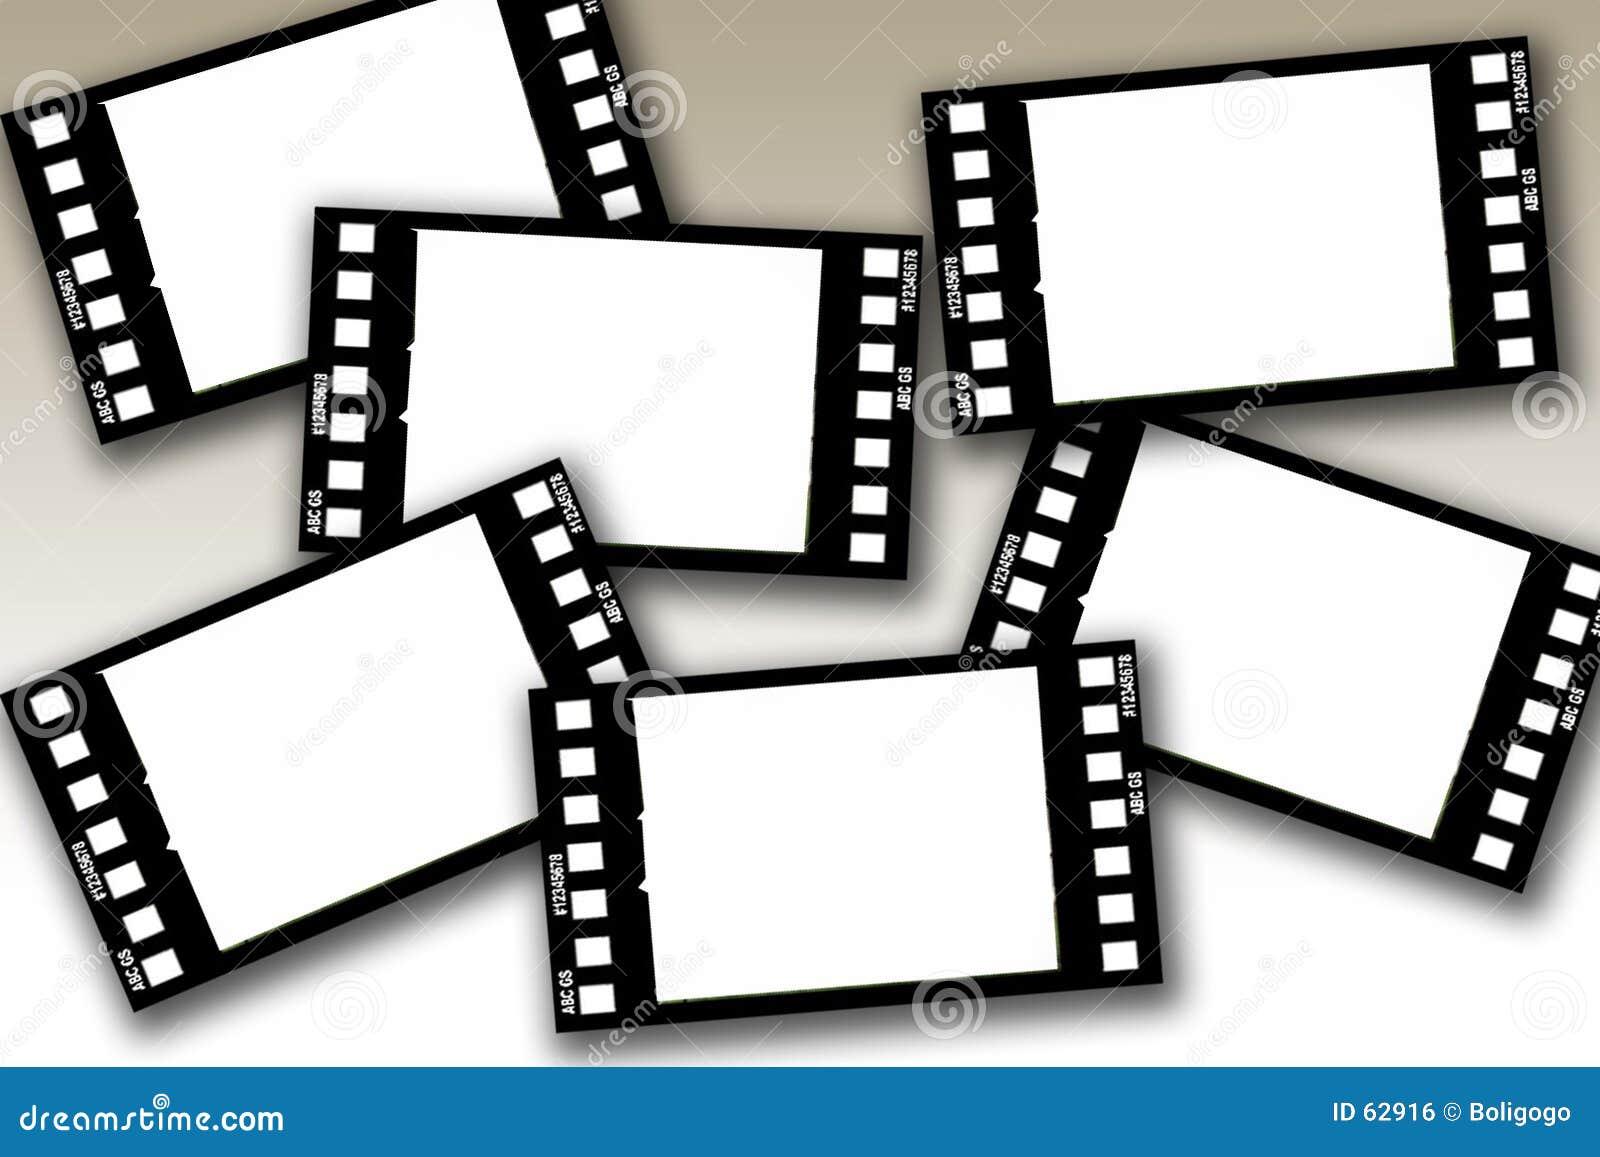 Download 胶卷画面 库存例证. 插画 包括有 艺术, 短冷期, 纹理, grunge, 即时, 弄脏, 照相机, 生成, 牌照 - 62916